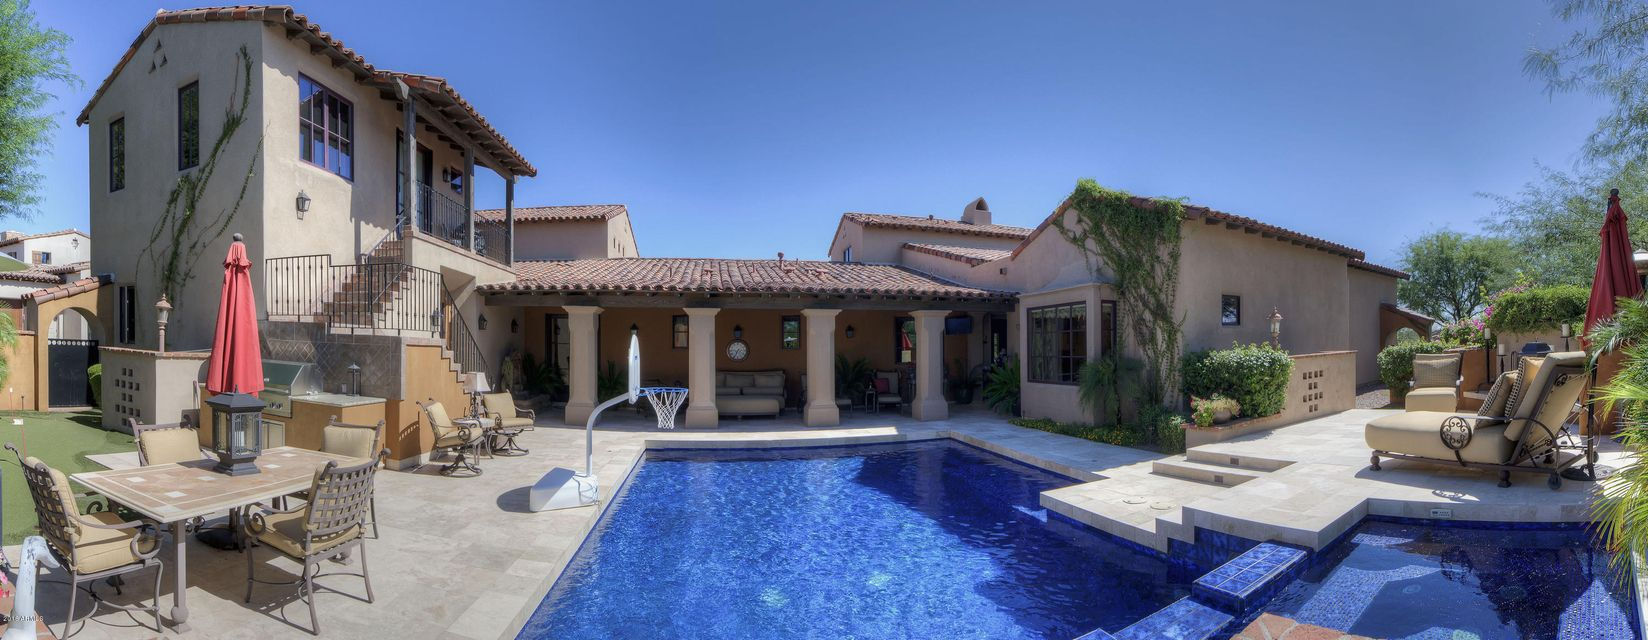 MLS 5568479 10126 E Havasupai Drive, Scottsdale, AZ 85255 Scottsdale AZ Silverleaf